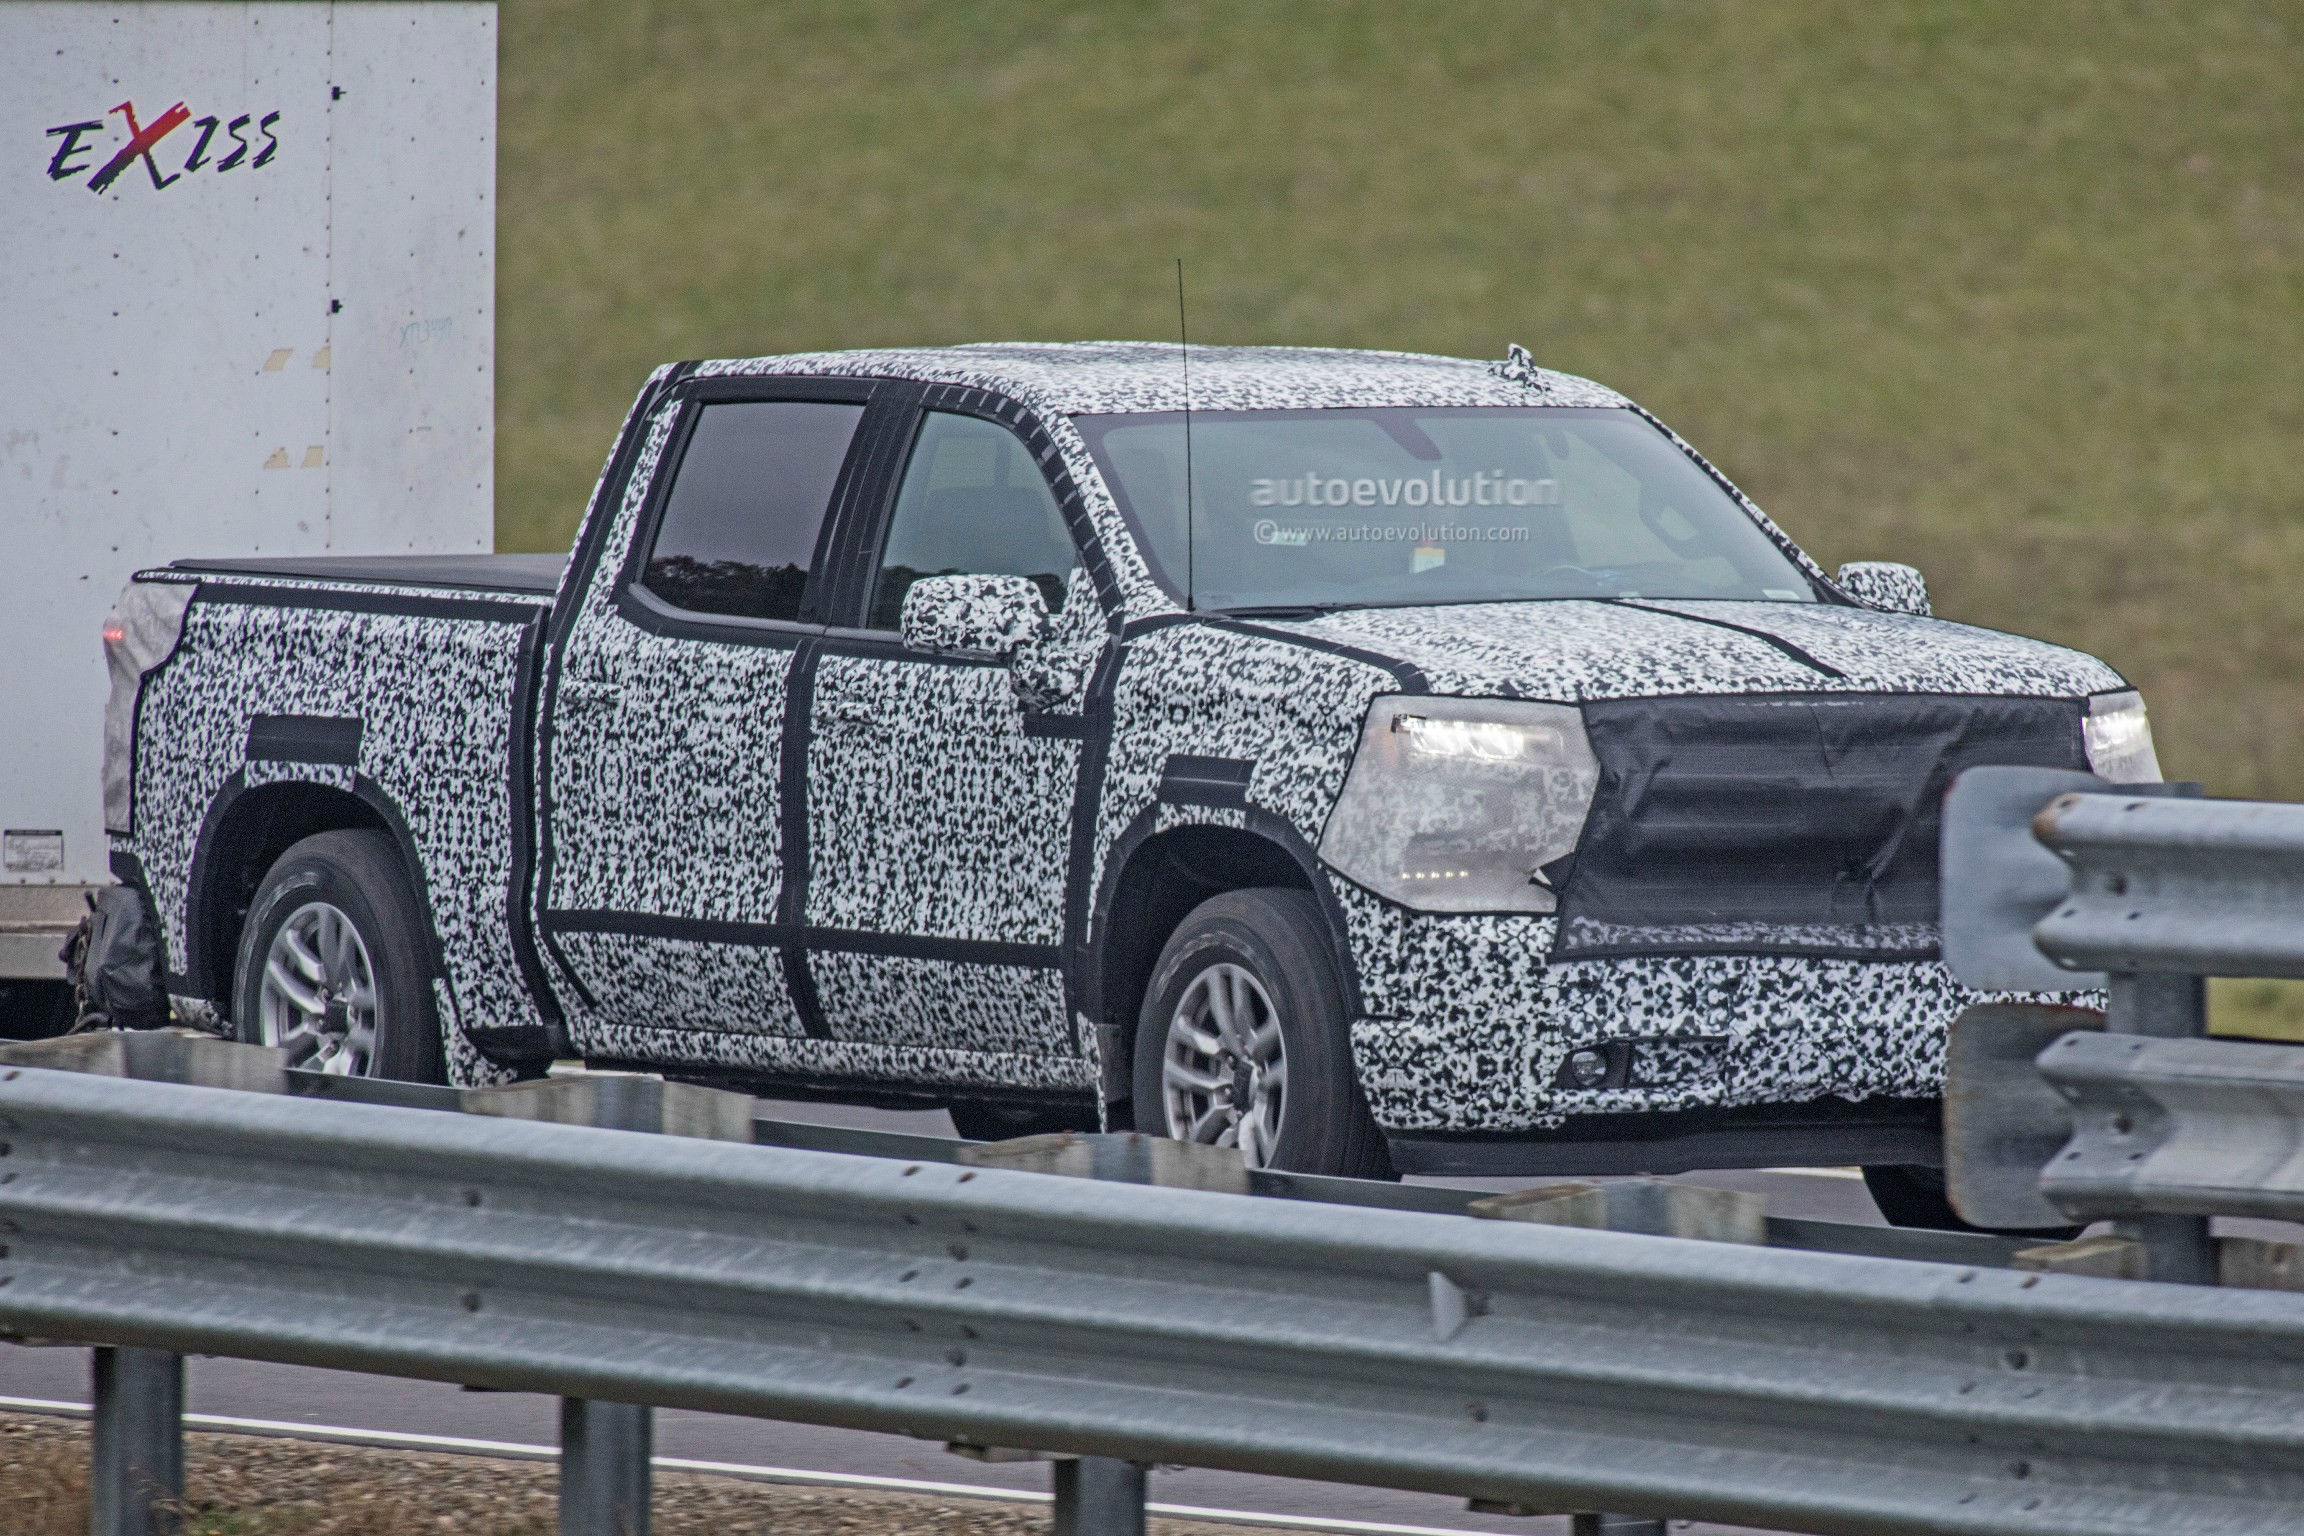 Spyshots 2019 Chevrolet Silverado Shows More Design Details